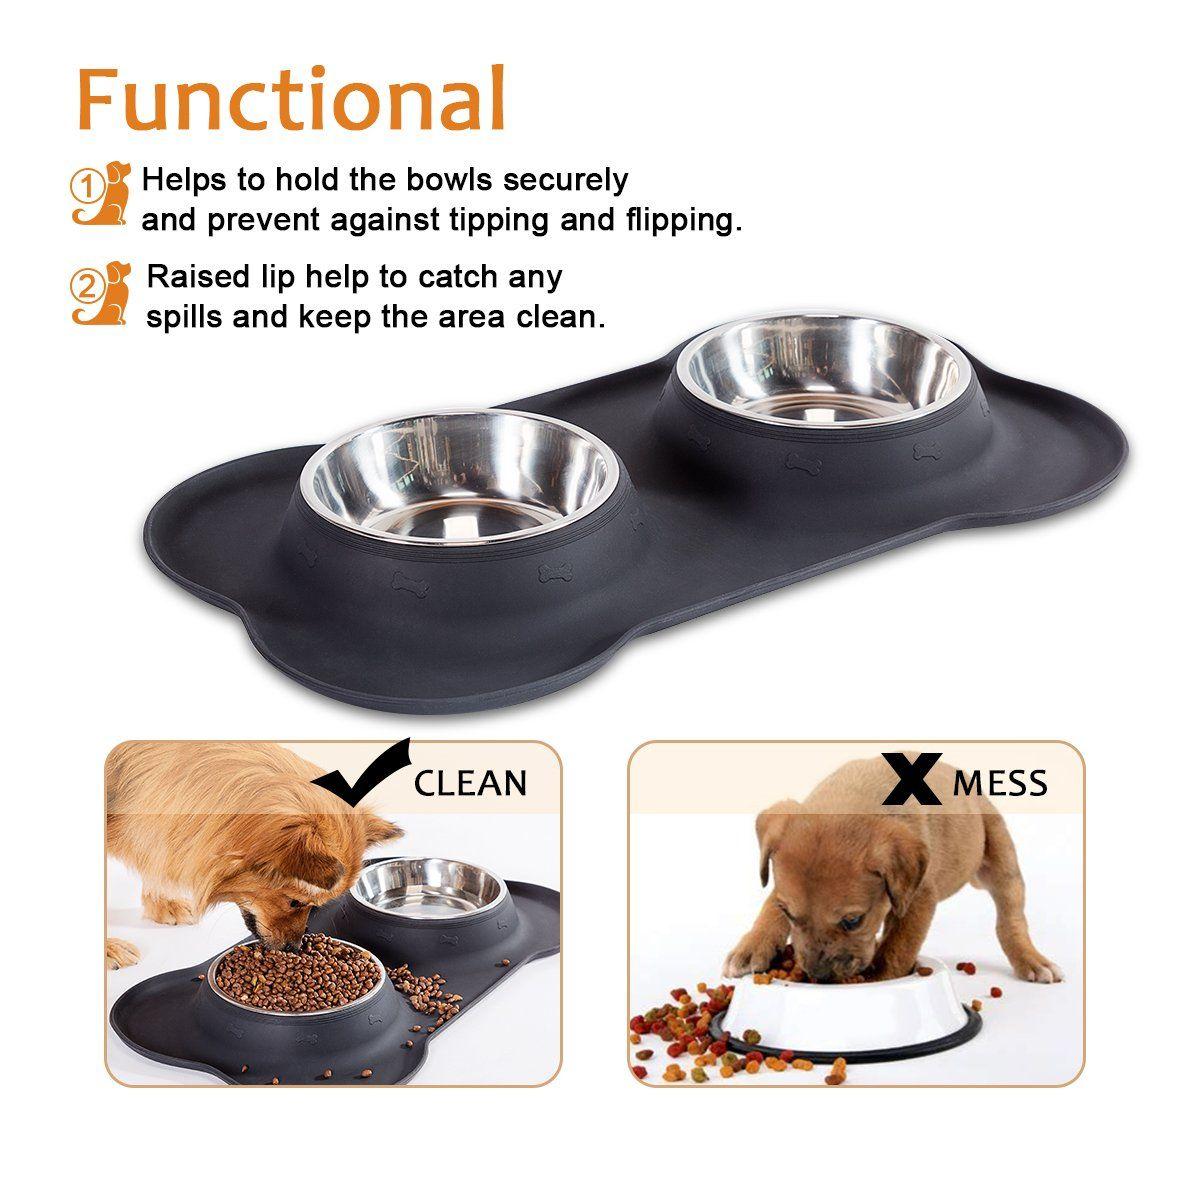 Ferplast 73007199pb Plastic Pet Kennel 11lb Fes4w Pallet Ordering